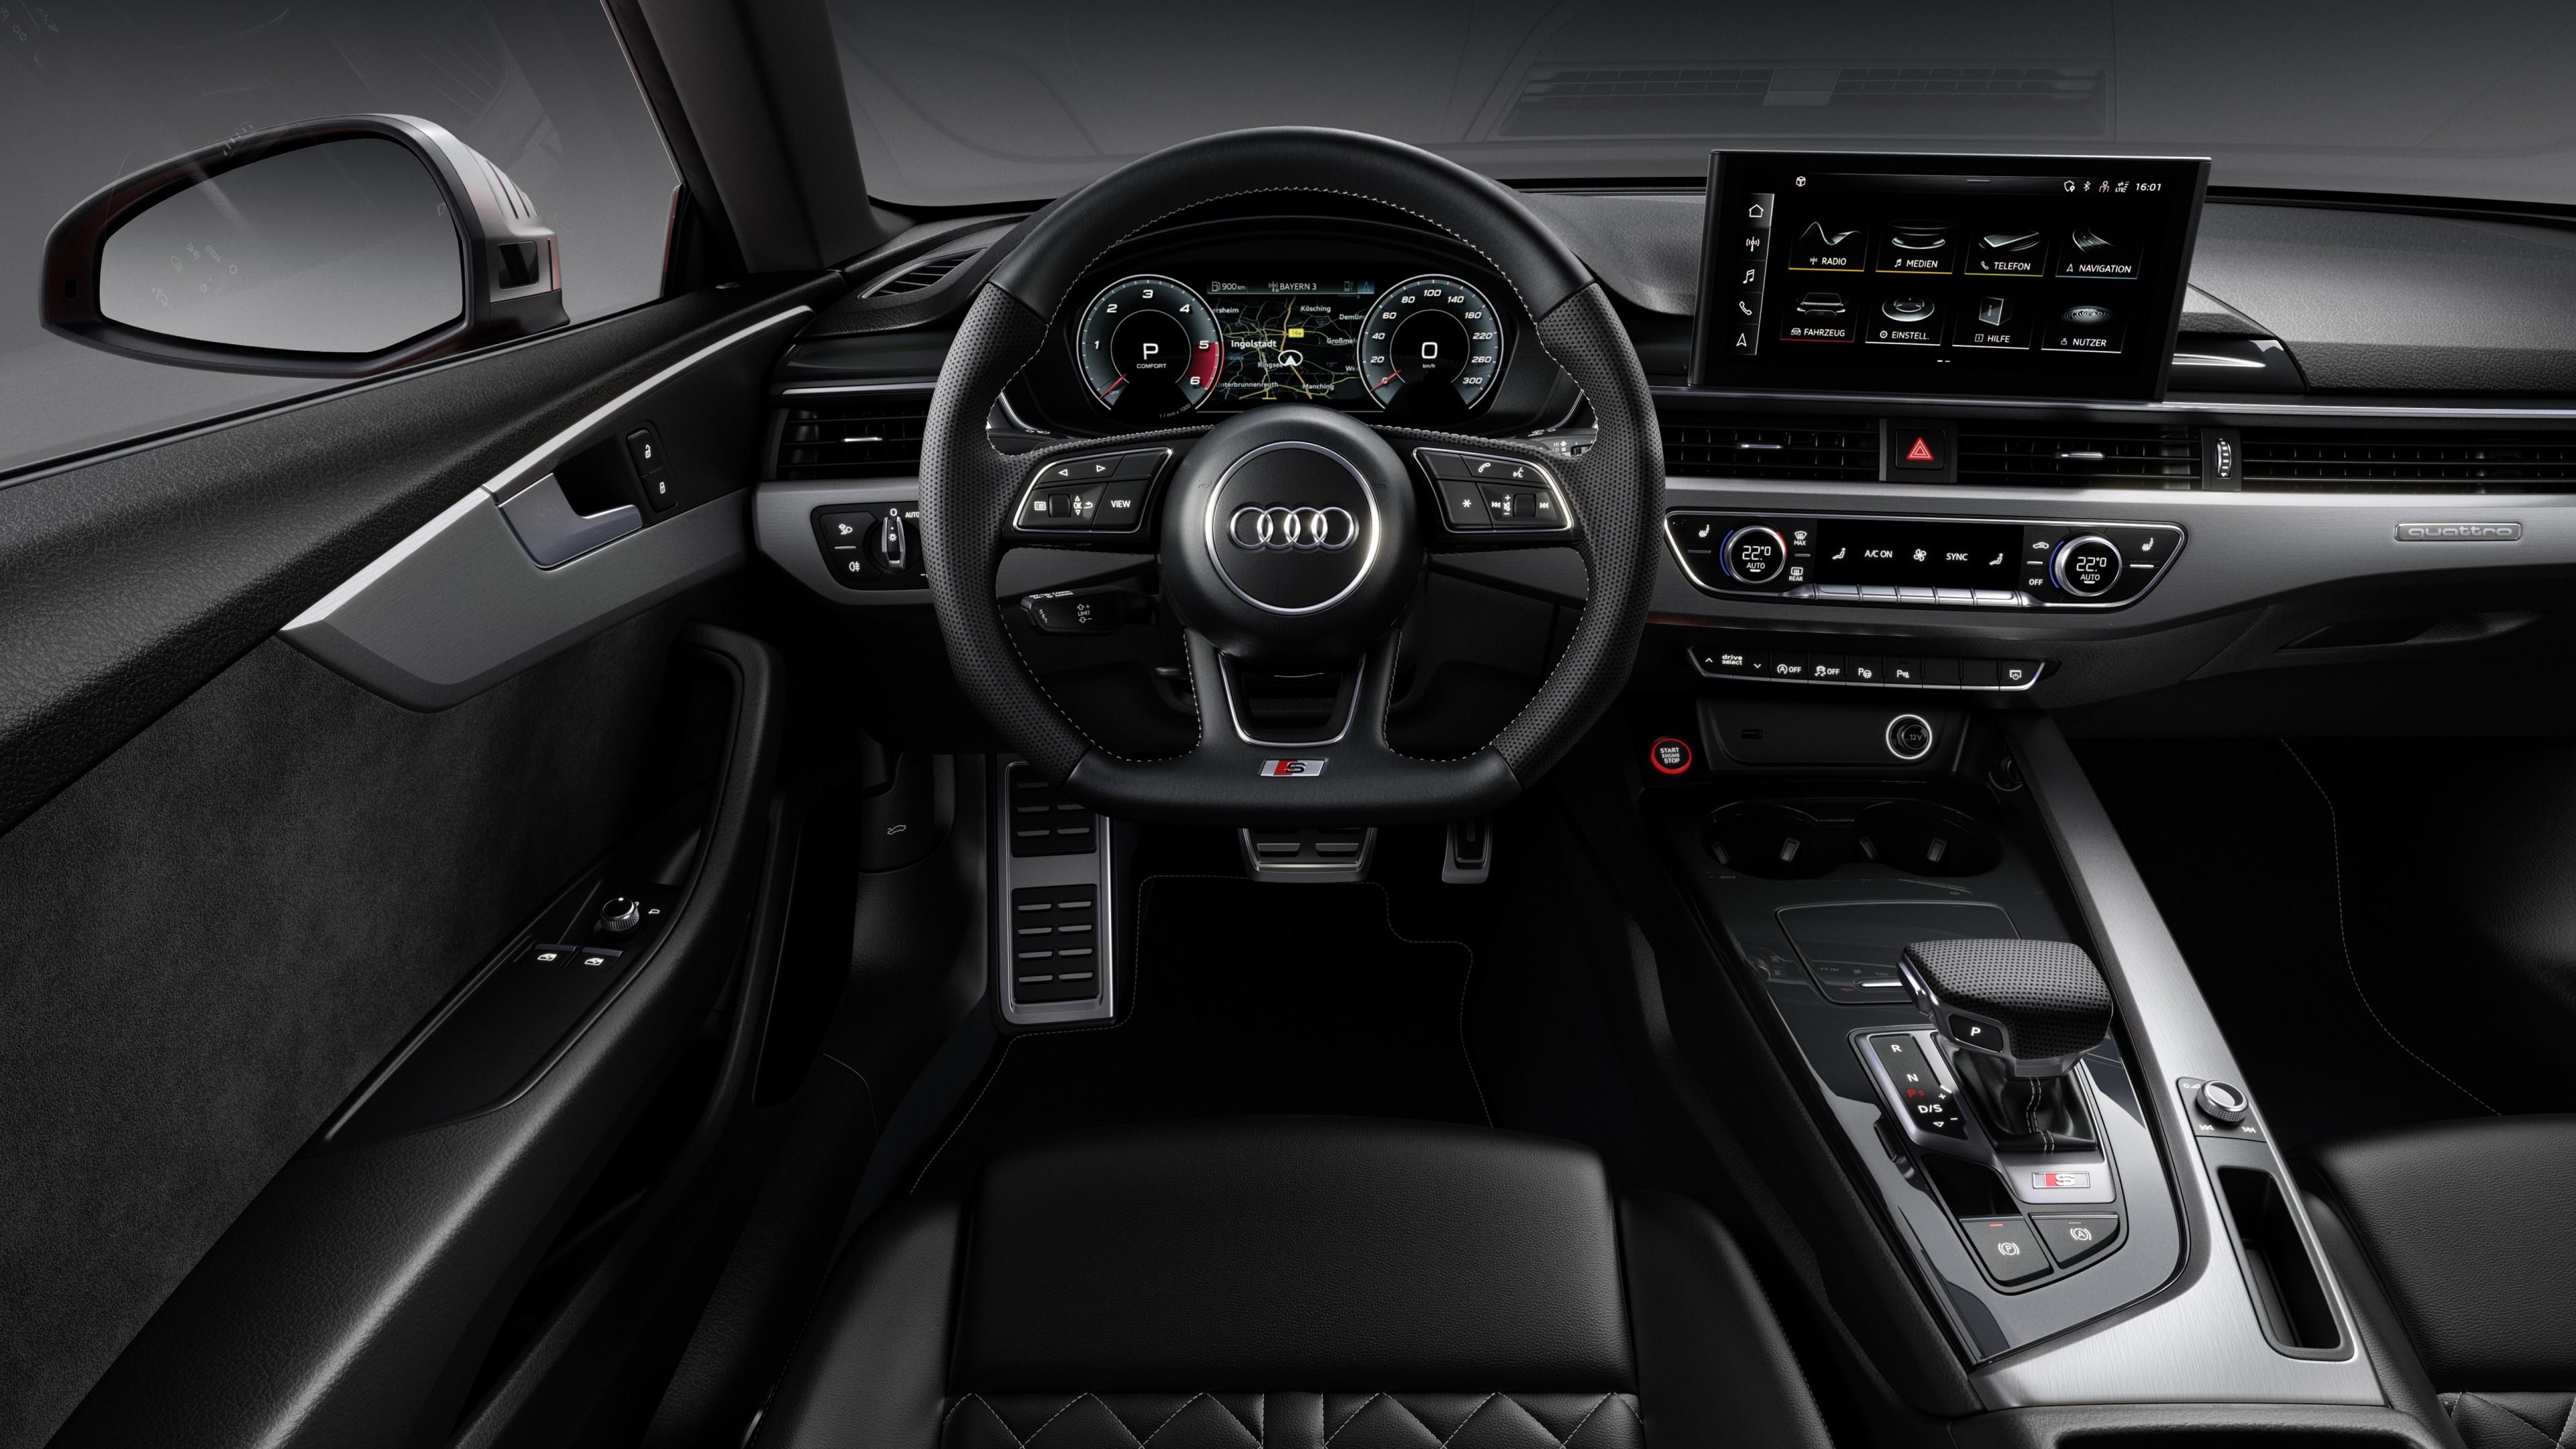 Audi S5 Coupe Tdi Interior Wallpaper Hd Car Wallpapers Id 13230